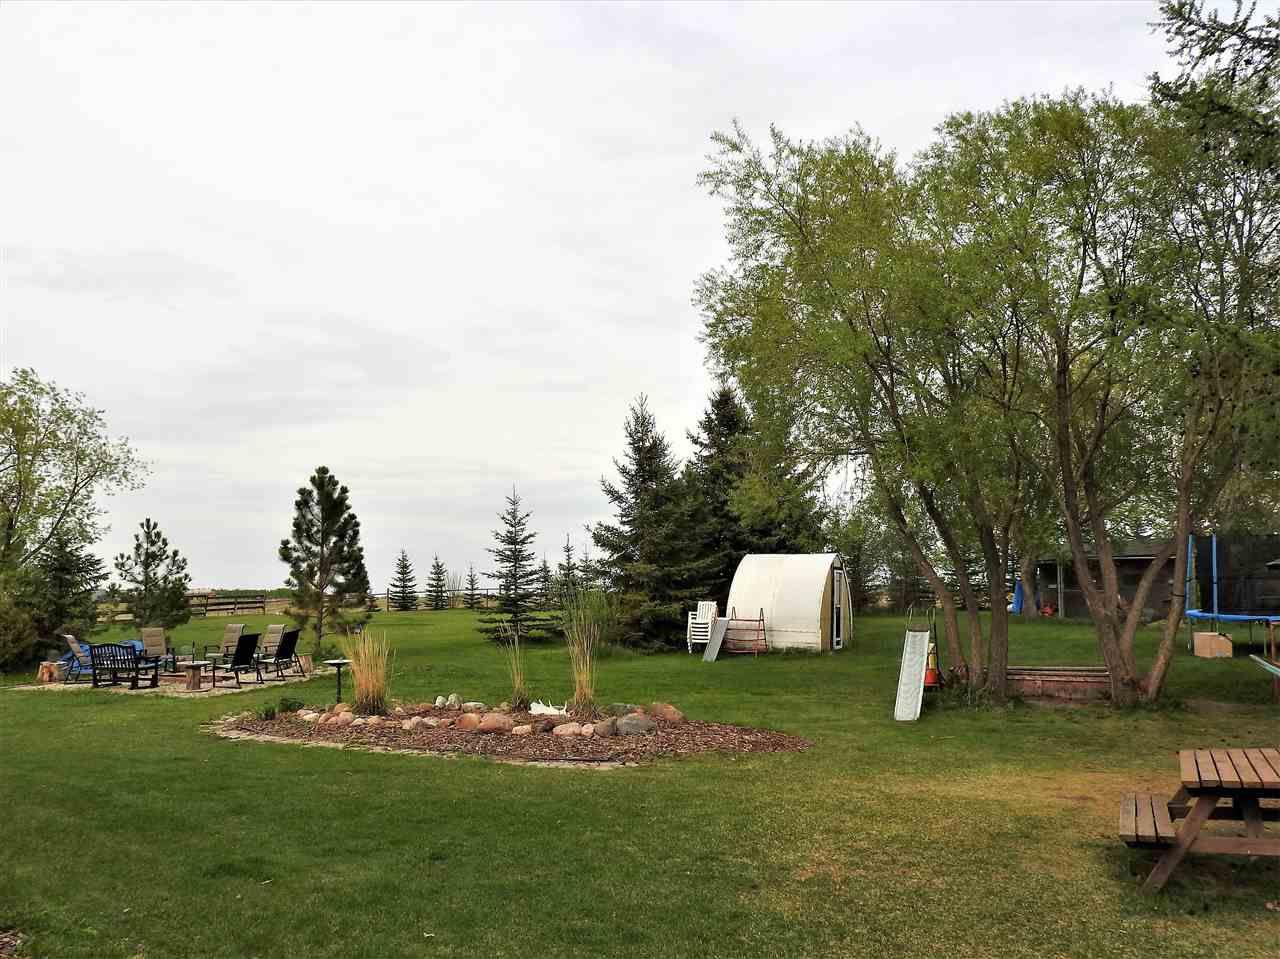 Photo 26: Photos: 55301 RGE RD 262: Rural Sturgeon County House for sale : MLS®# E4158158